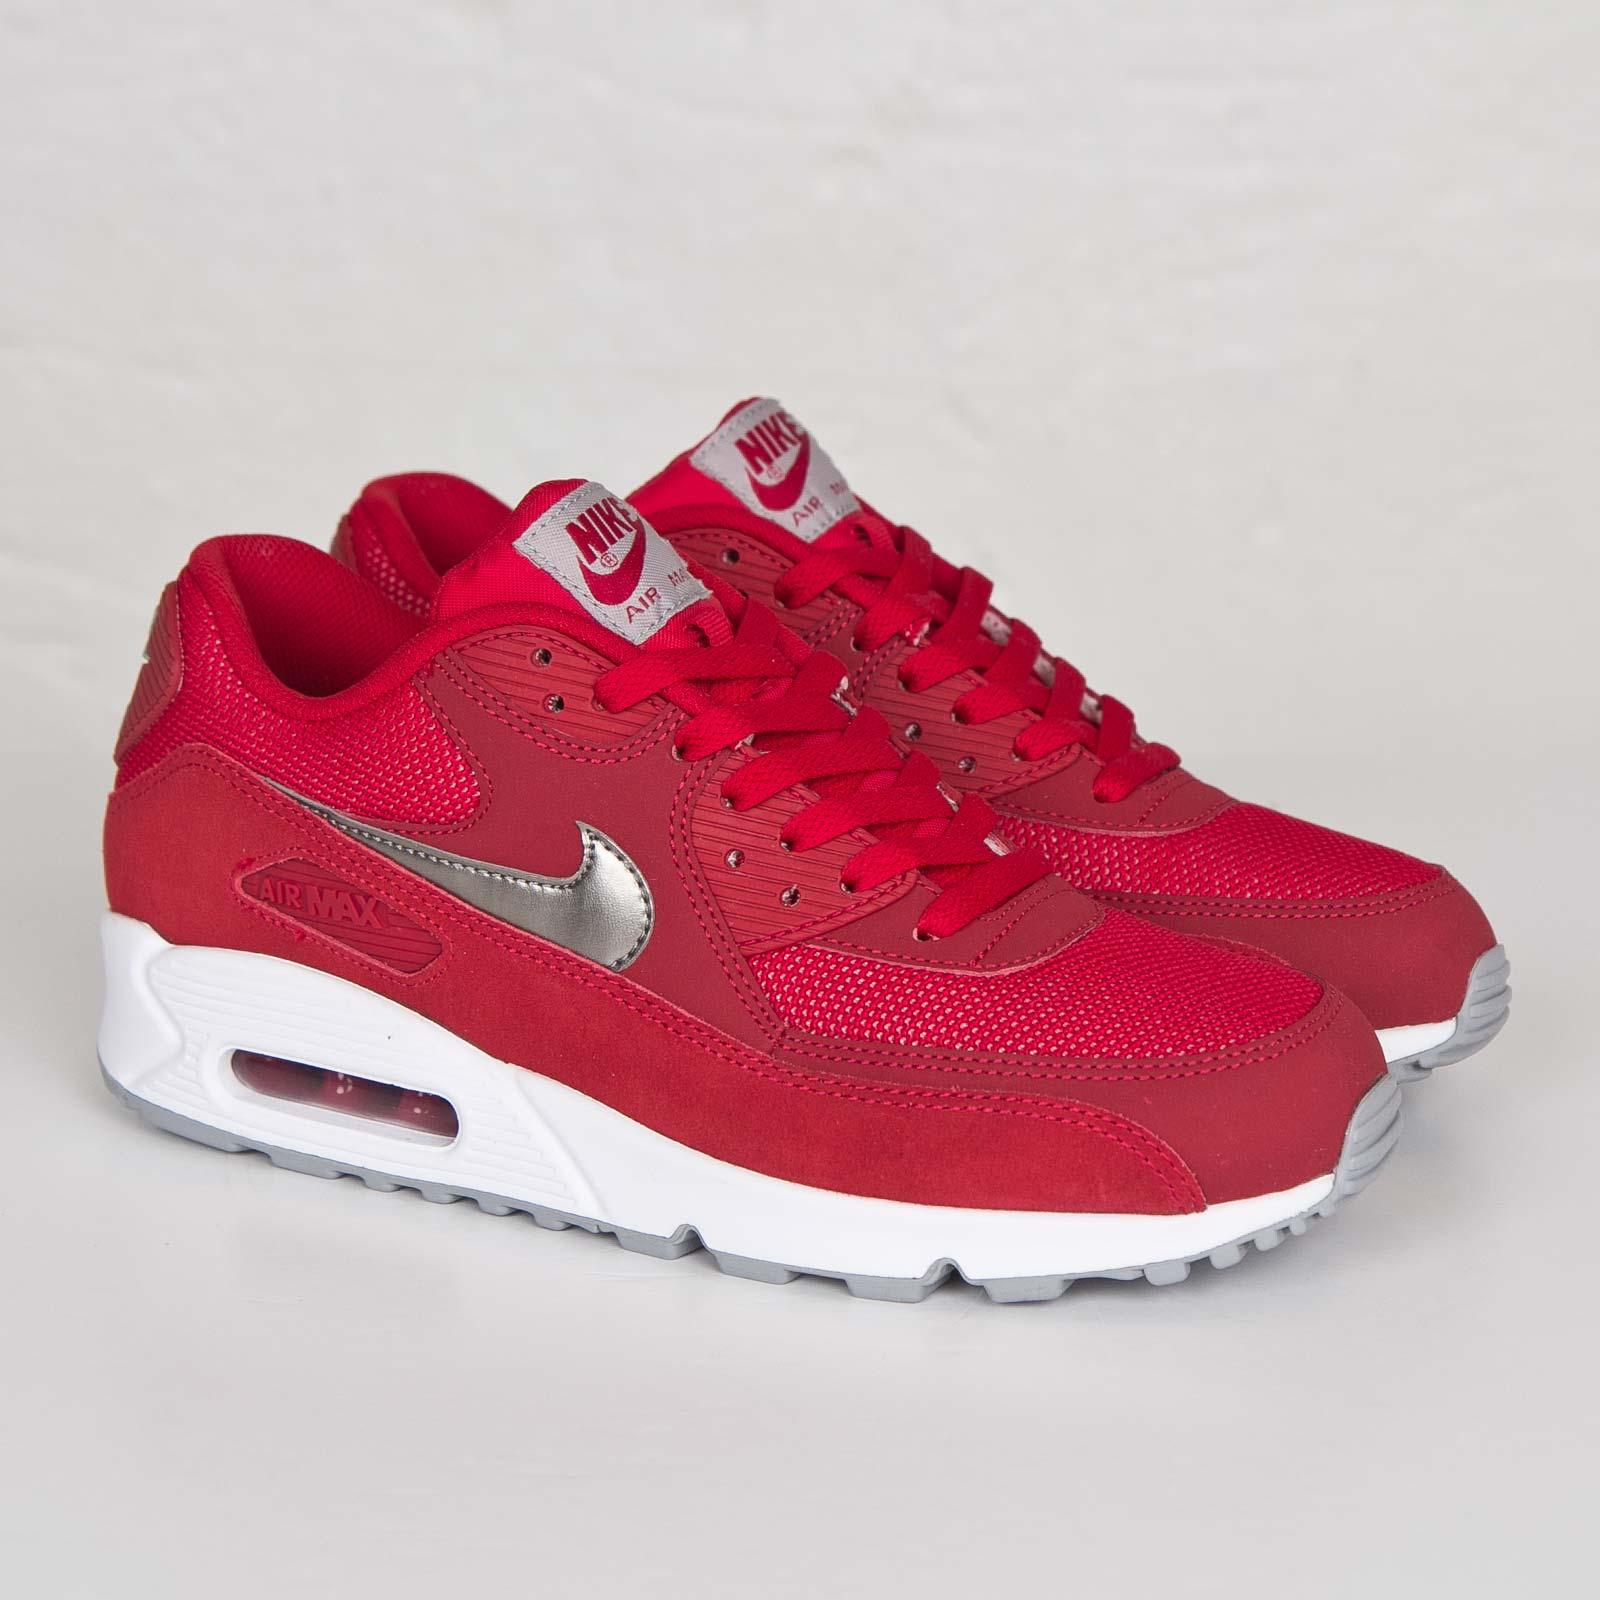 7cb549aec5 Nike Air Max 90 Essential - 537384-602 - Sneakersnstuff | sneakers ...